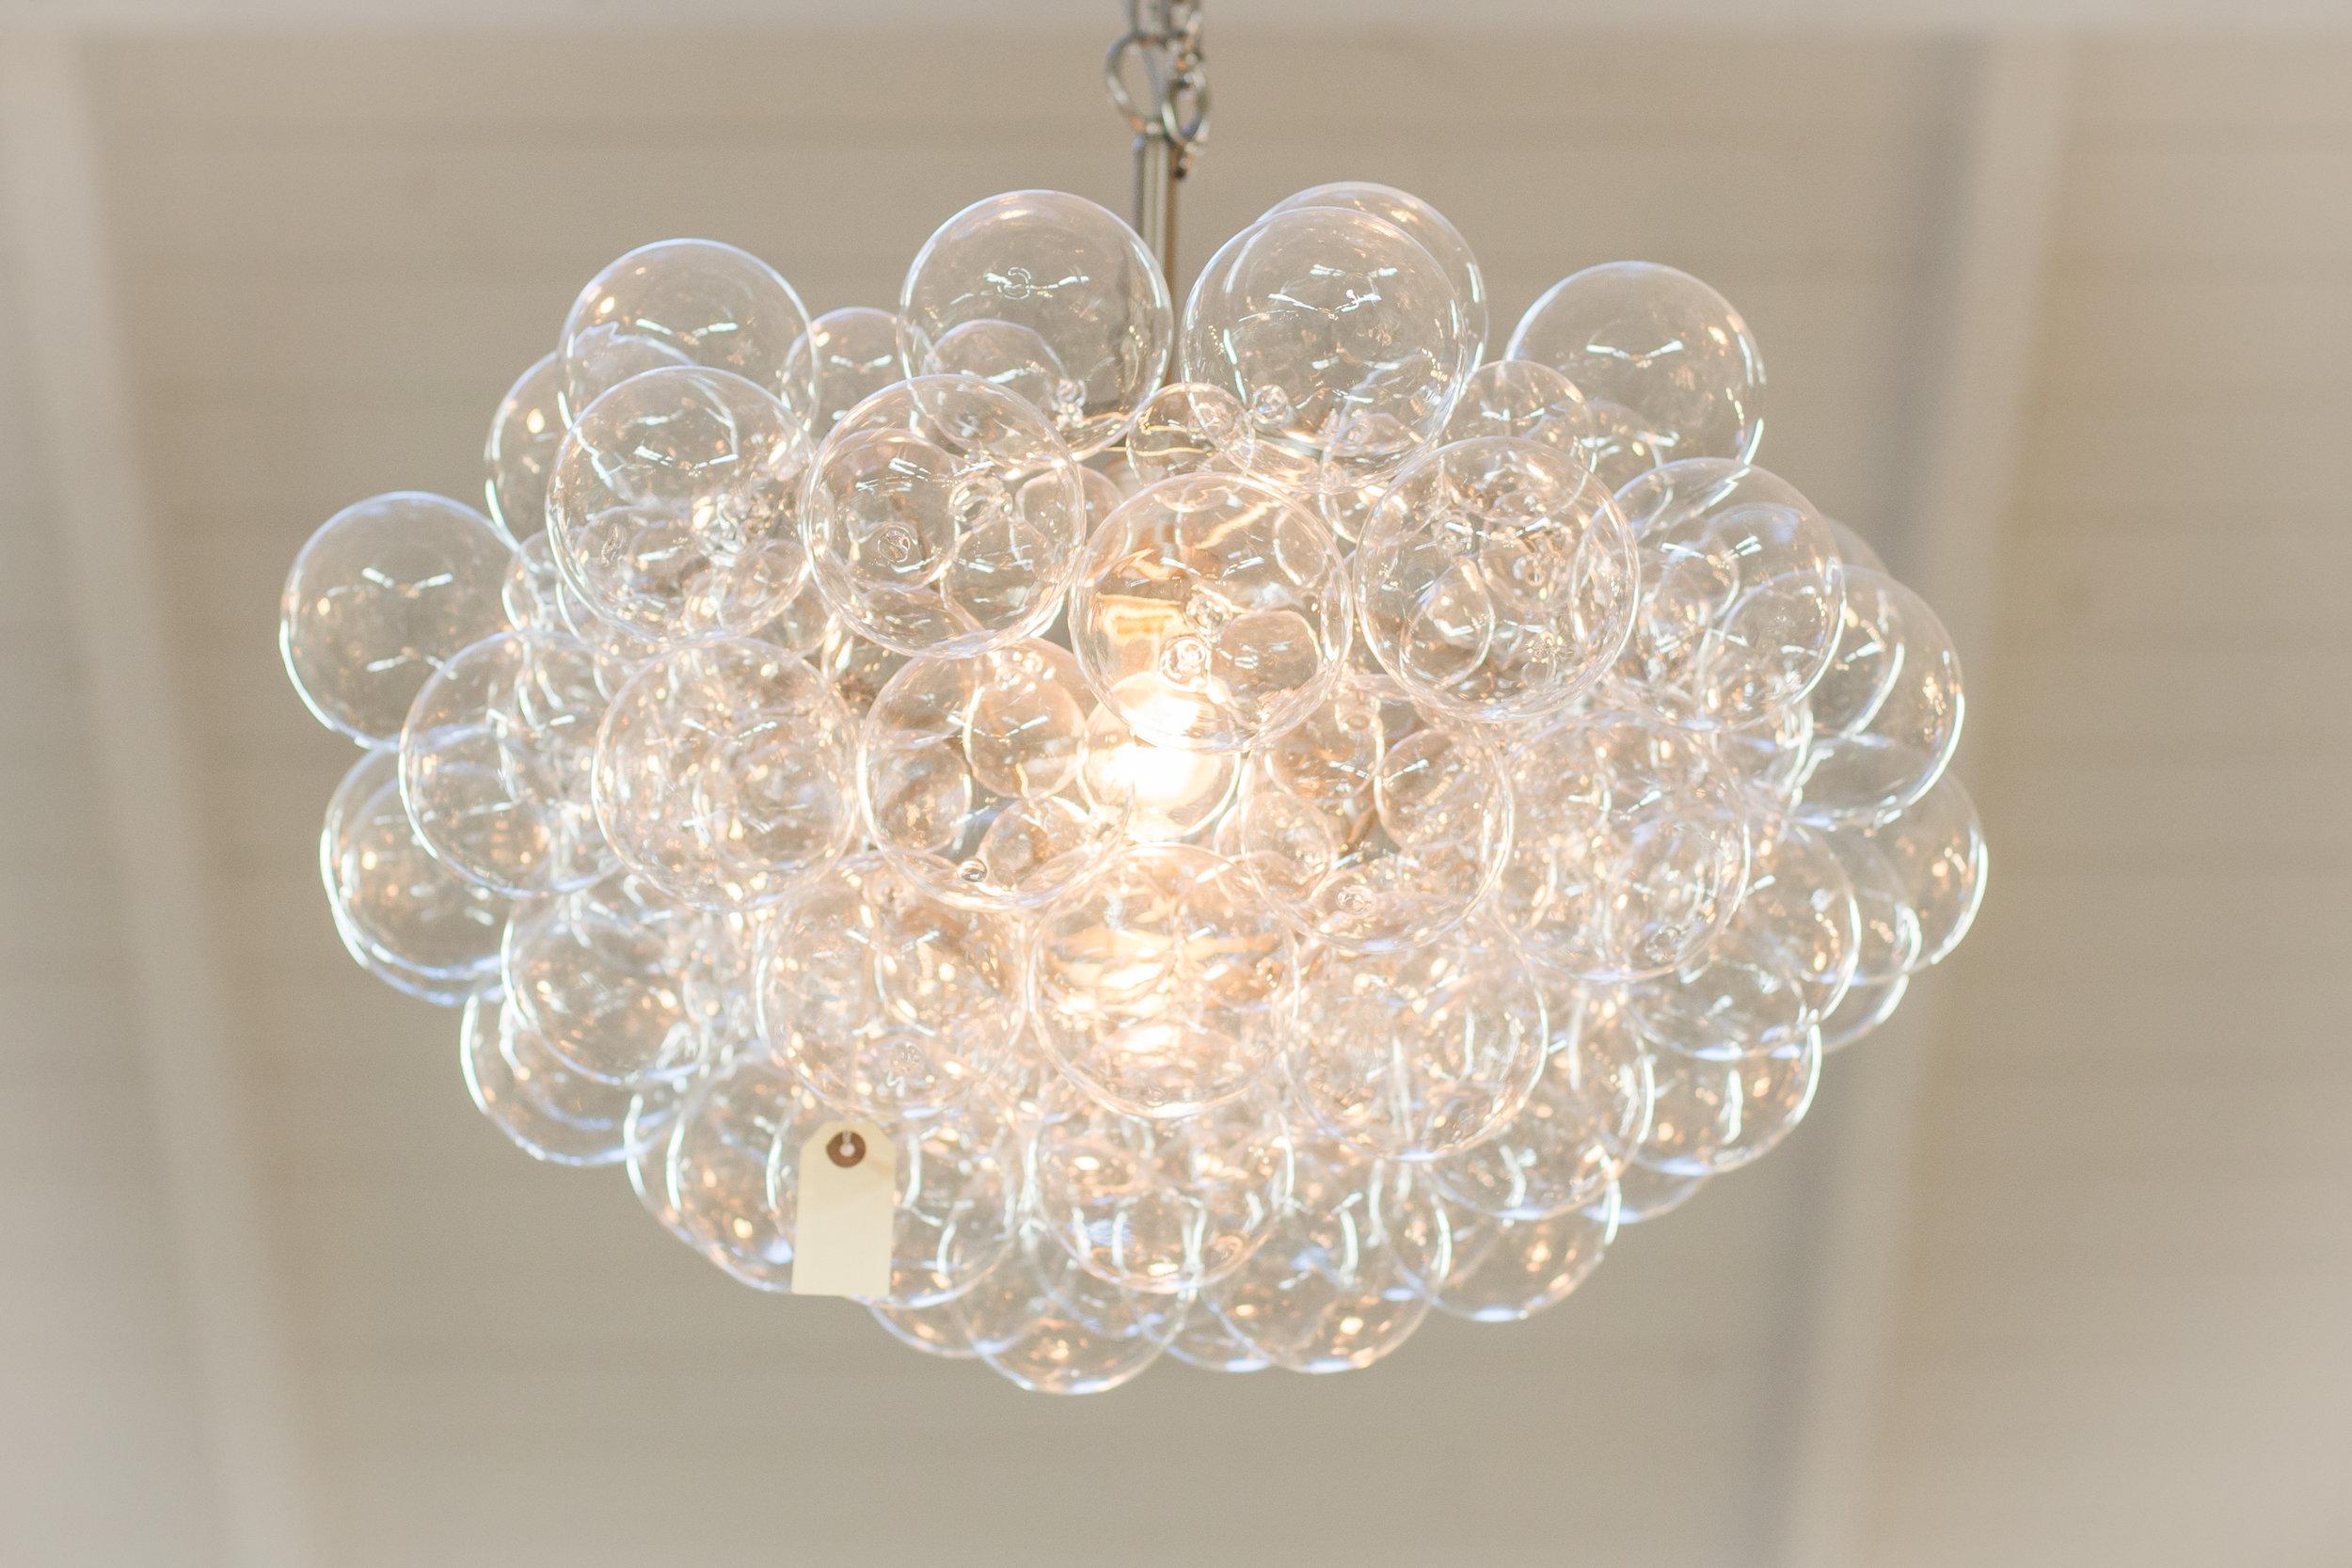 Bubble glass bulb chandelier